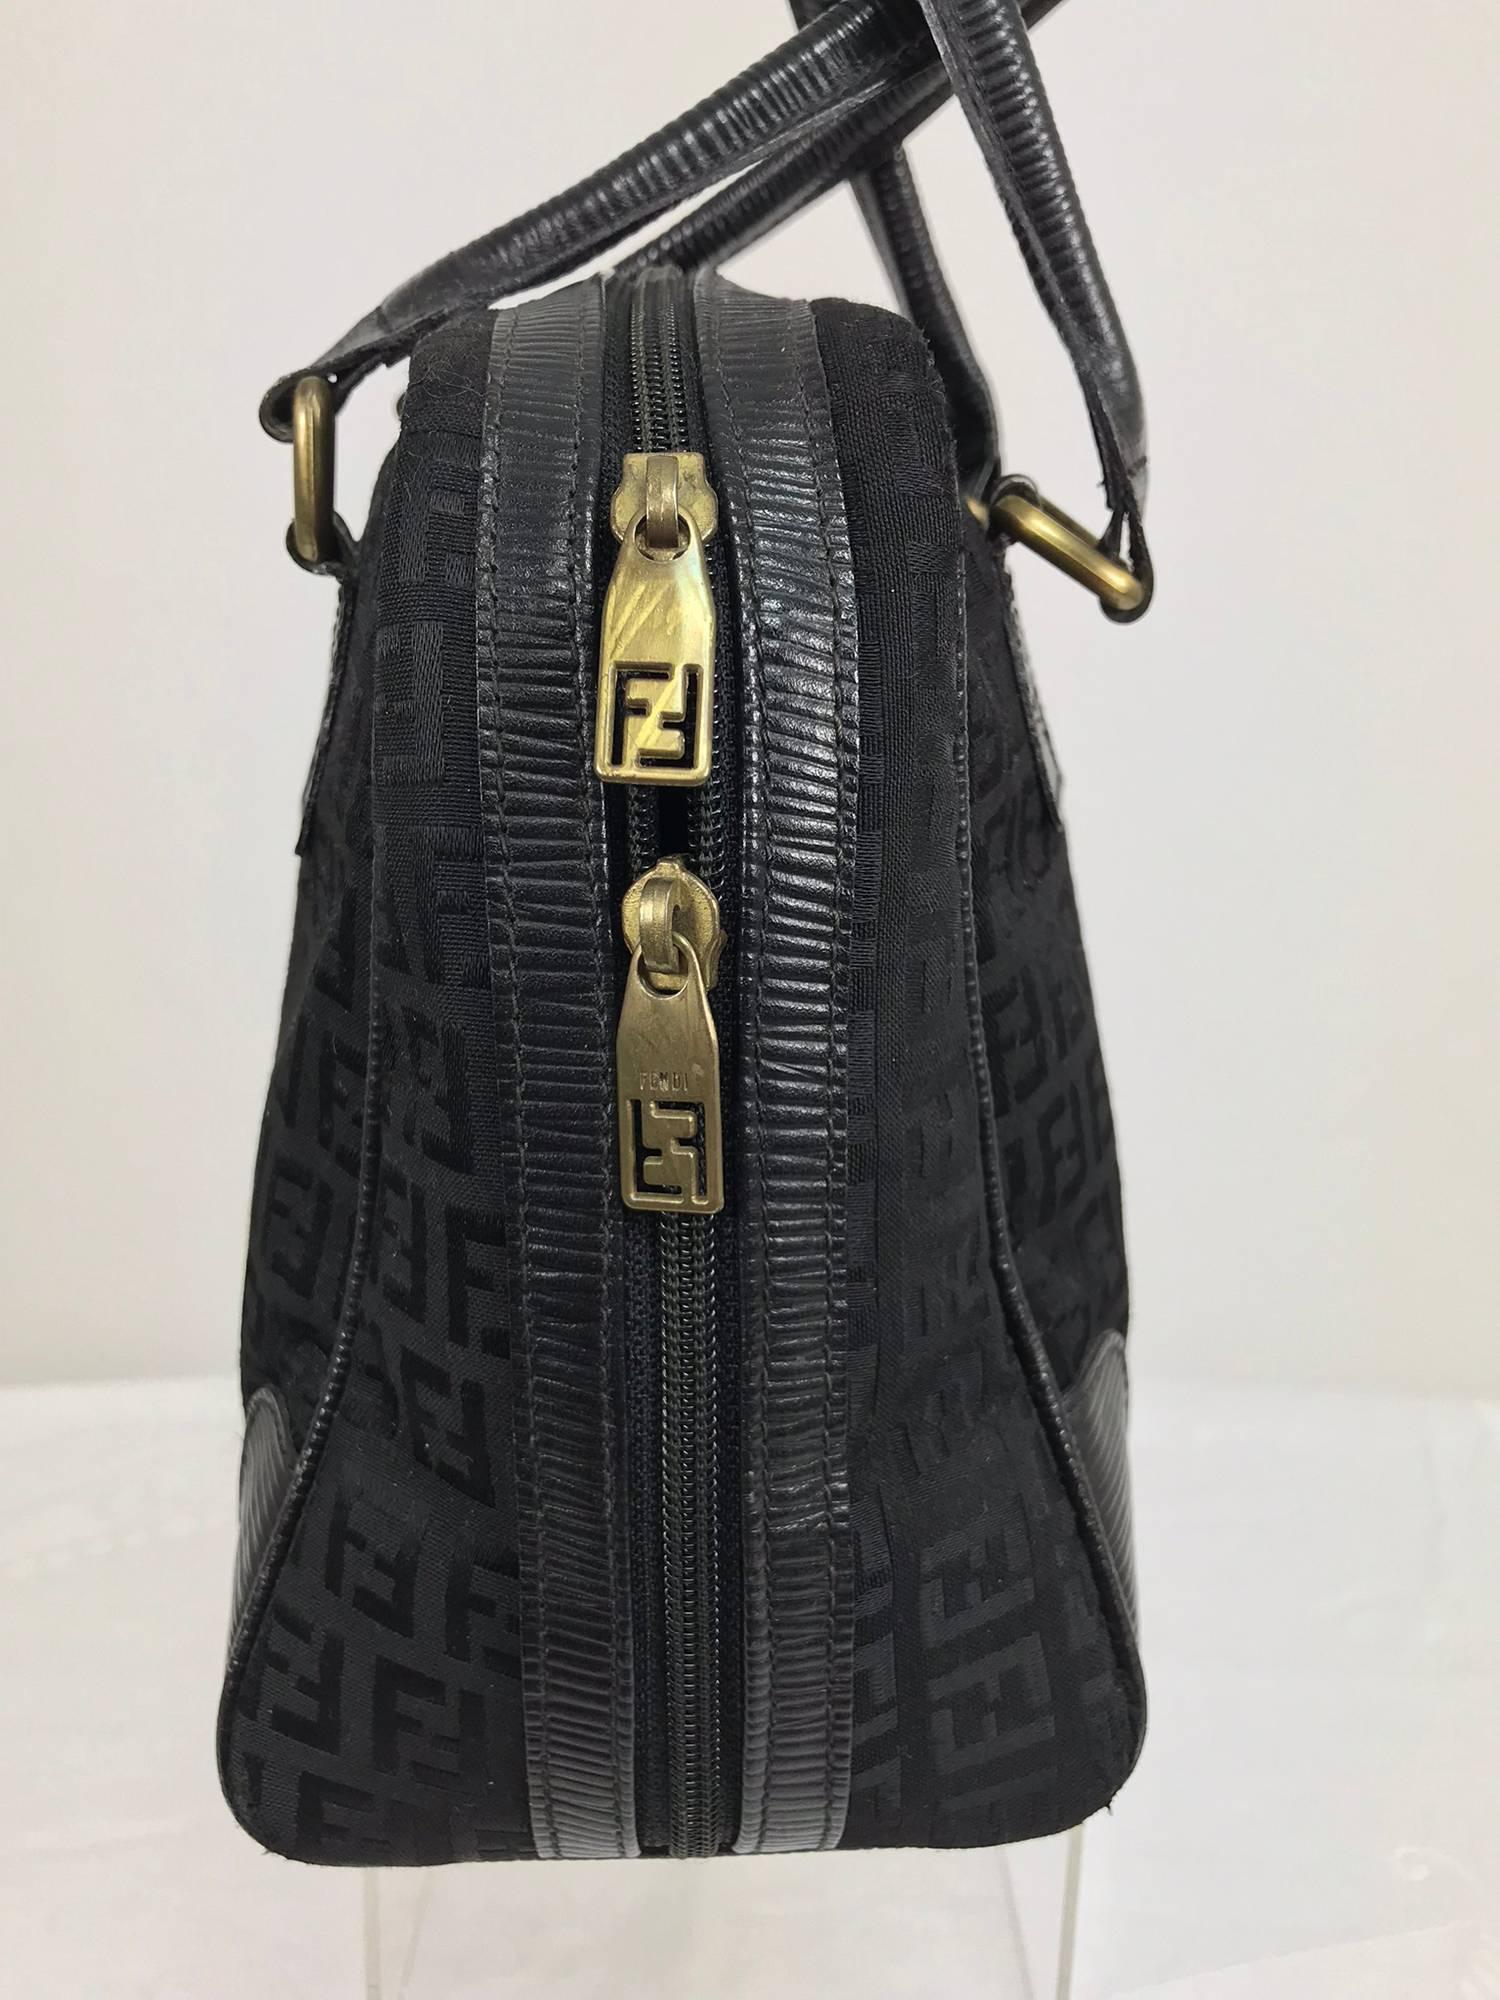 Fendi Black Logo Canvas And Leather Handbag 1970s 9ChmorWSk